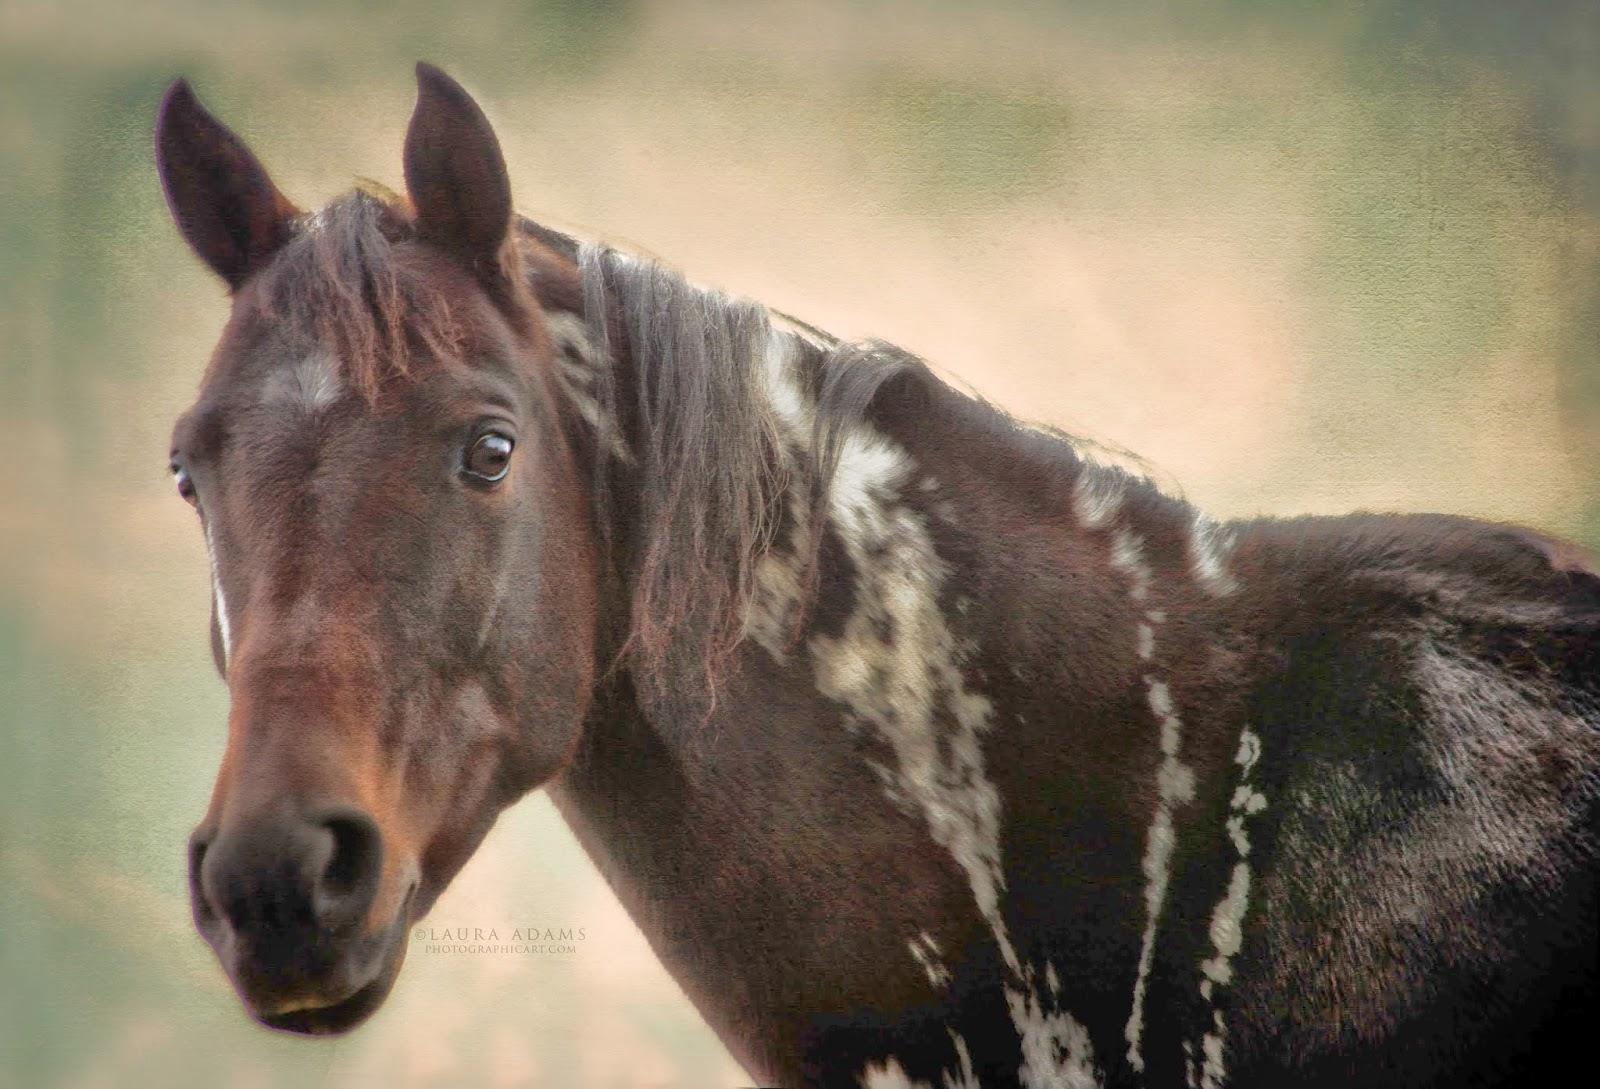 Laura Adams   Michigan Equine and Portrait Photographer ...